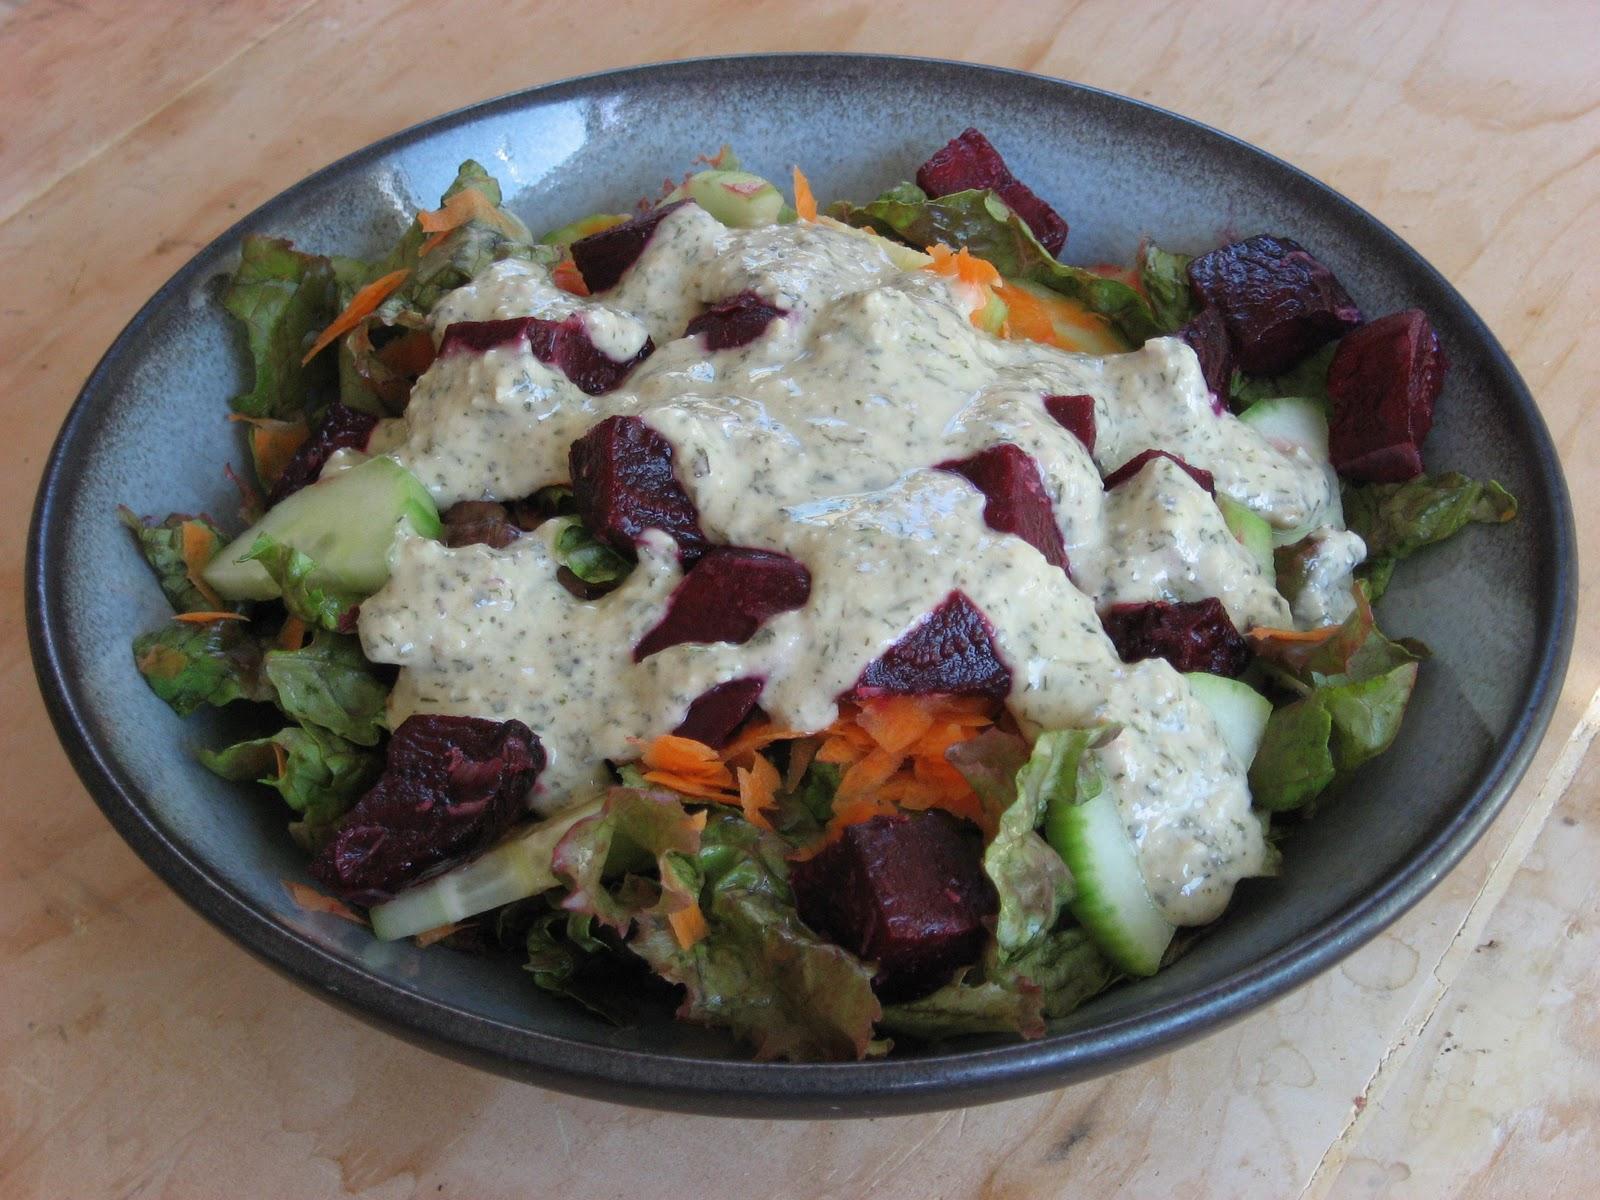 Creamy Herb Salad Dressing {vegan} - Recipes to Nourish